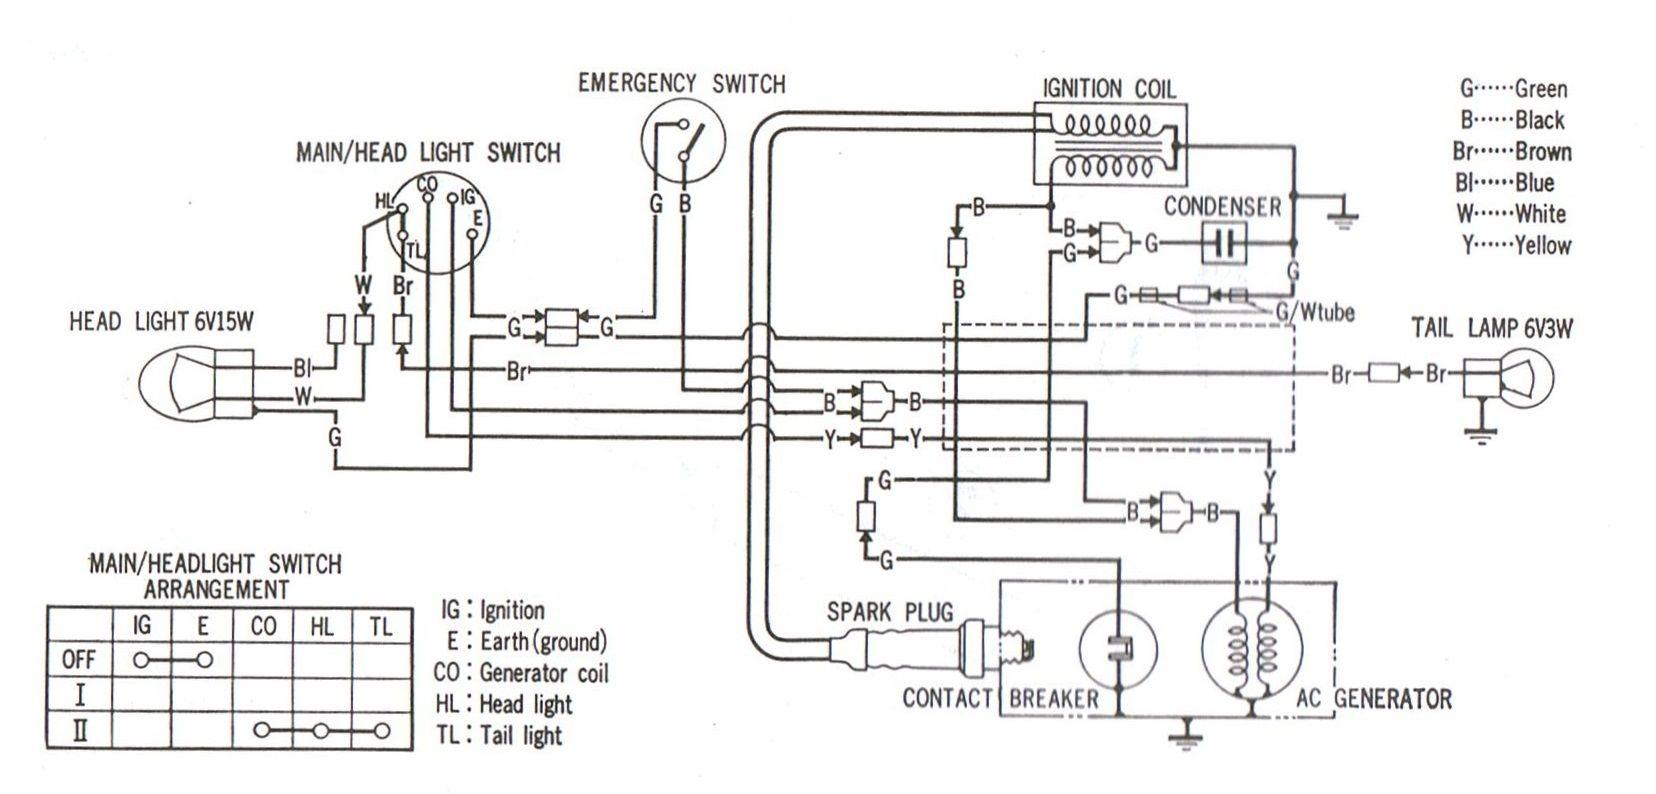 small resolution of extraordinary 1982 honda c70 passport wiring diagram gallery best volvo c70 wiring diagram pdf c70 wiring diagram